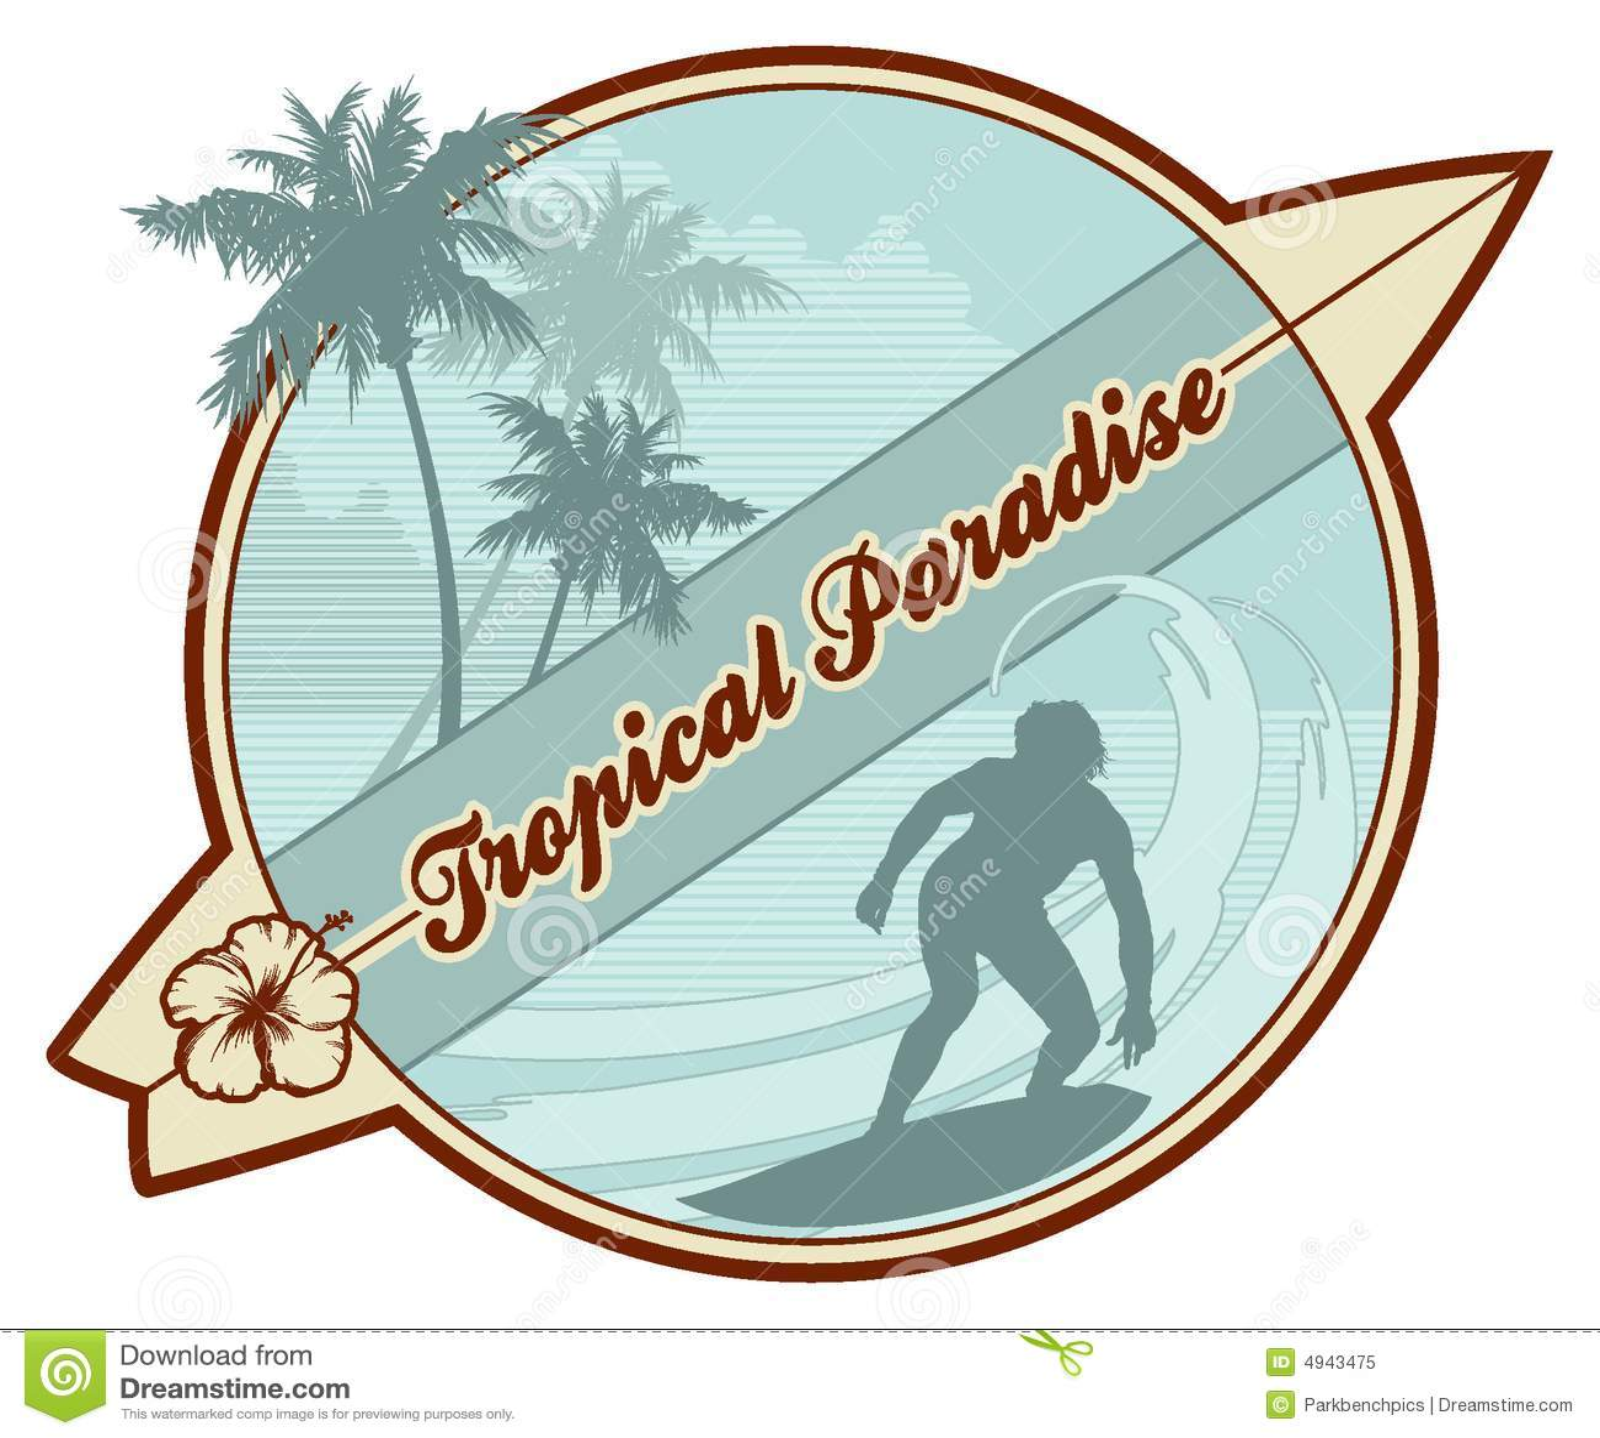 Retro Beach Illustration Royalty Free Stock Photo: Tropical Retro-surf Stock Vector. Illustration Of